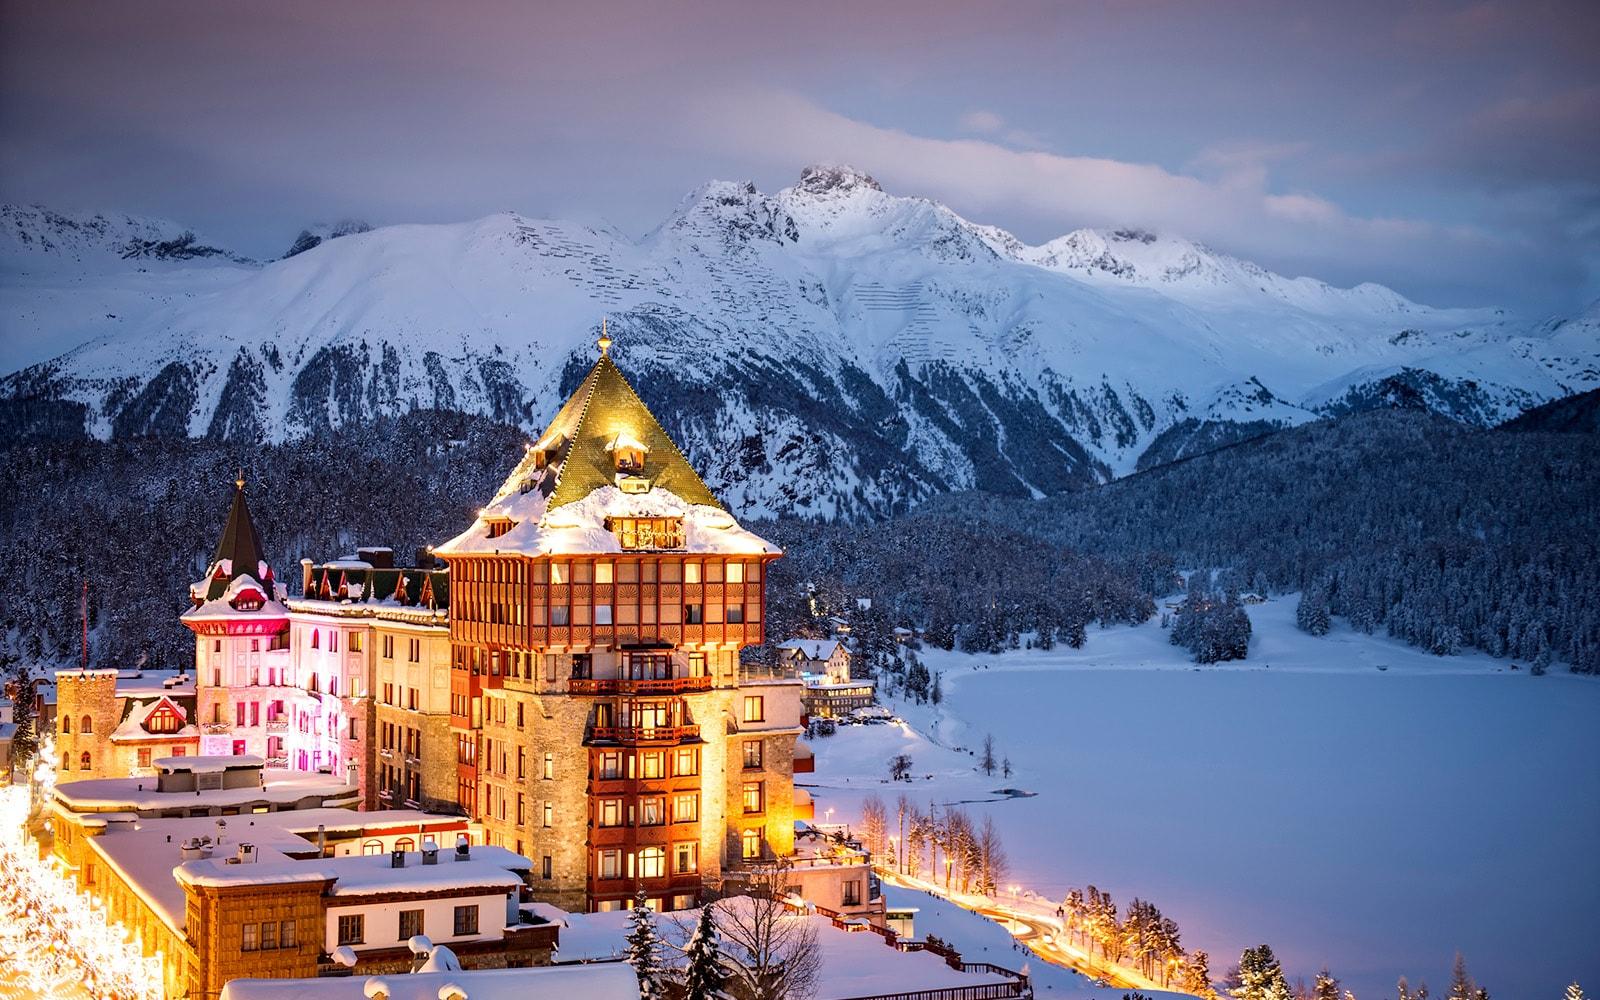 Badrutt's Palace, St. Moritz, Engandina